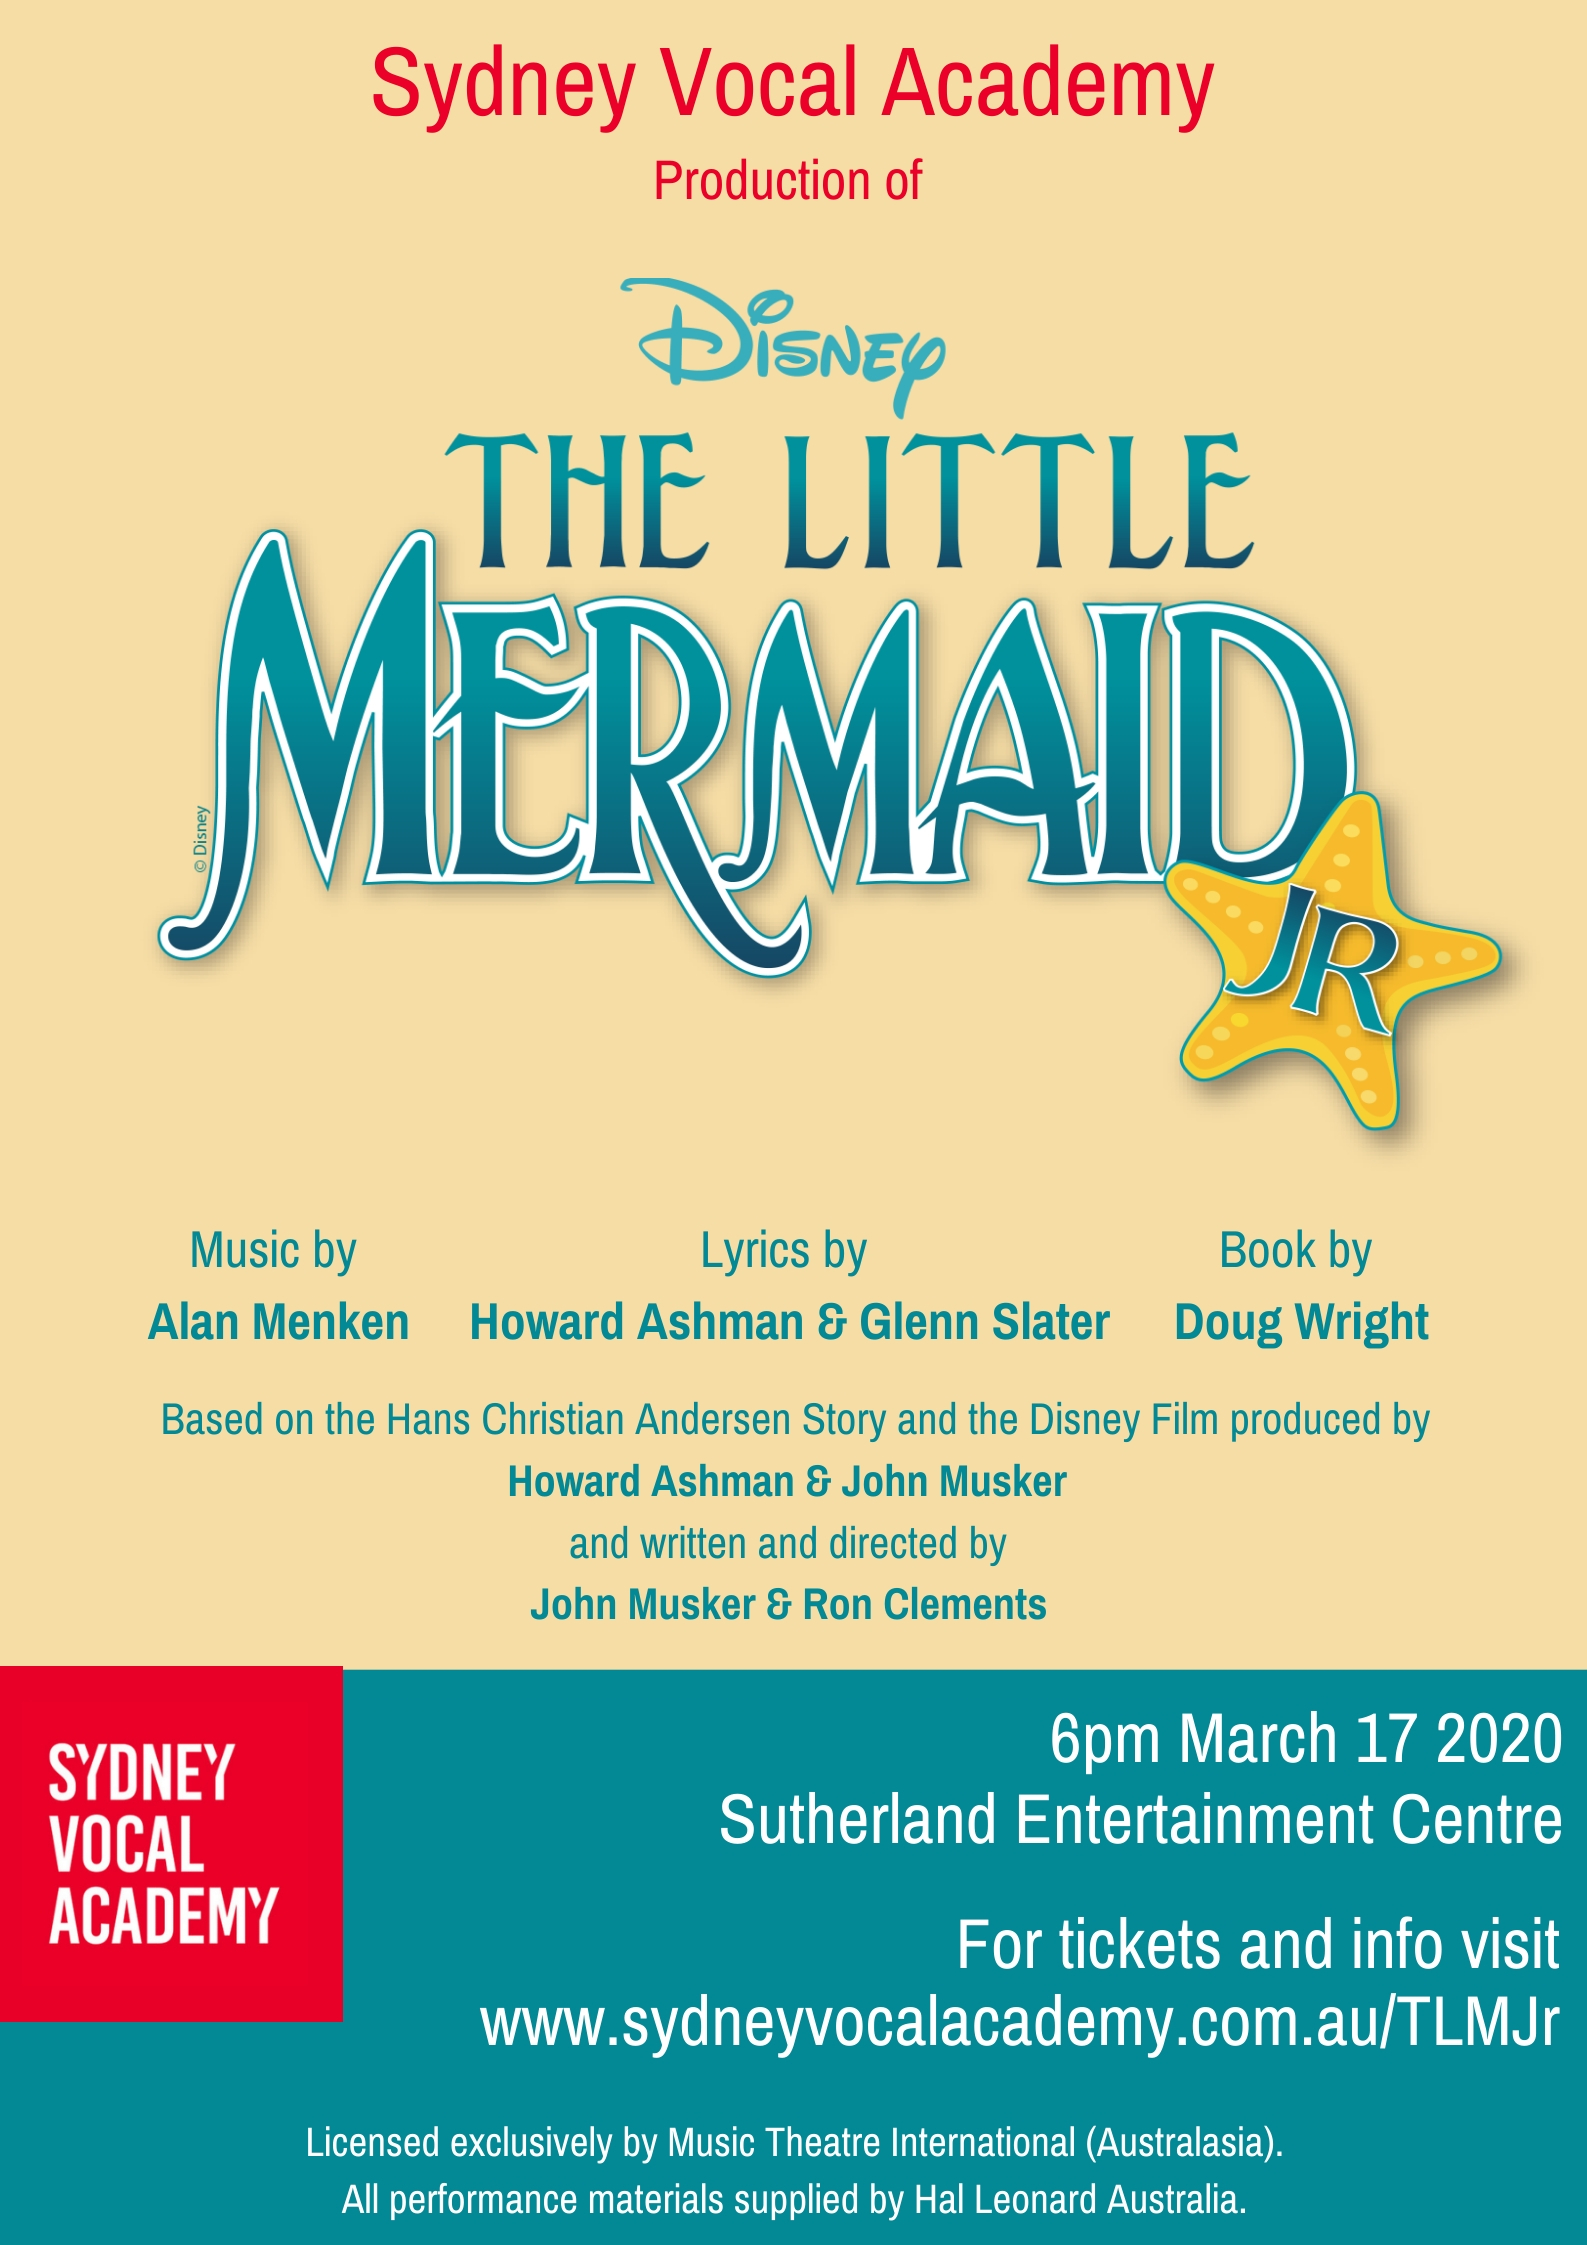 The Little Mermaid 1 - Tickets